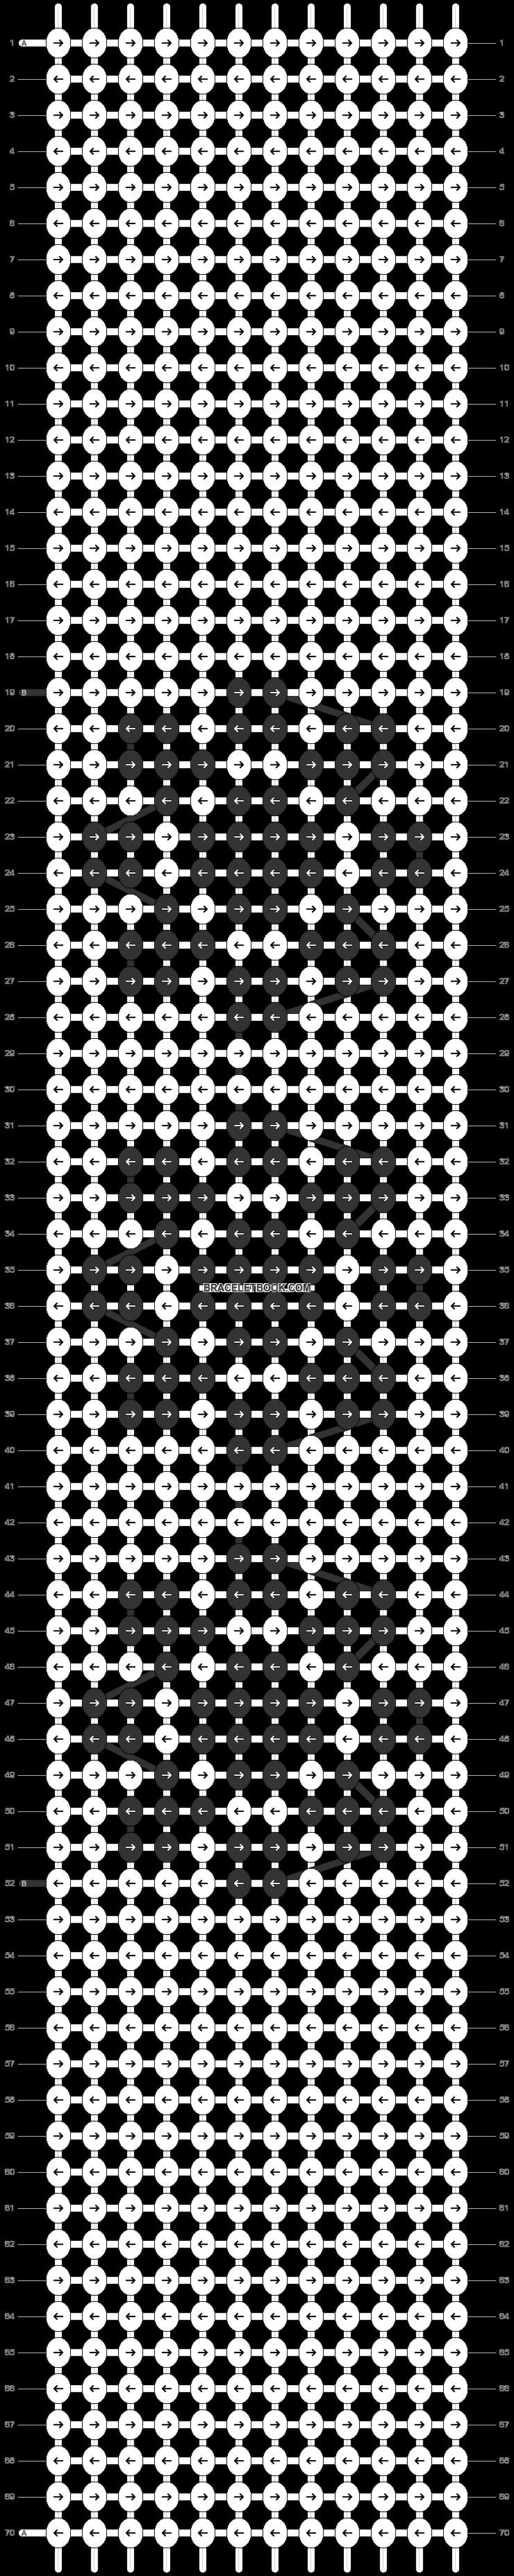 Alpha pattern #80294 variation #145851 pattern